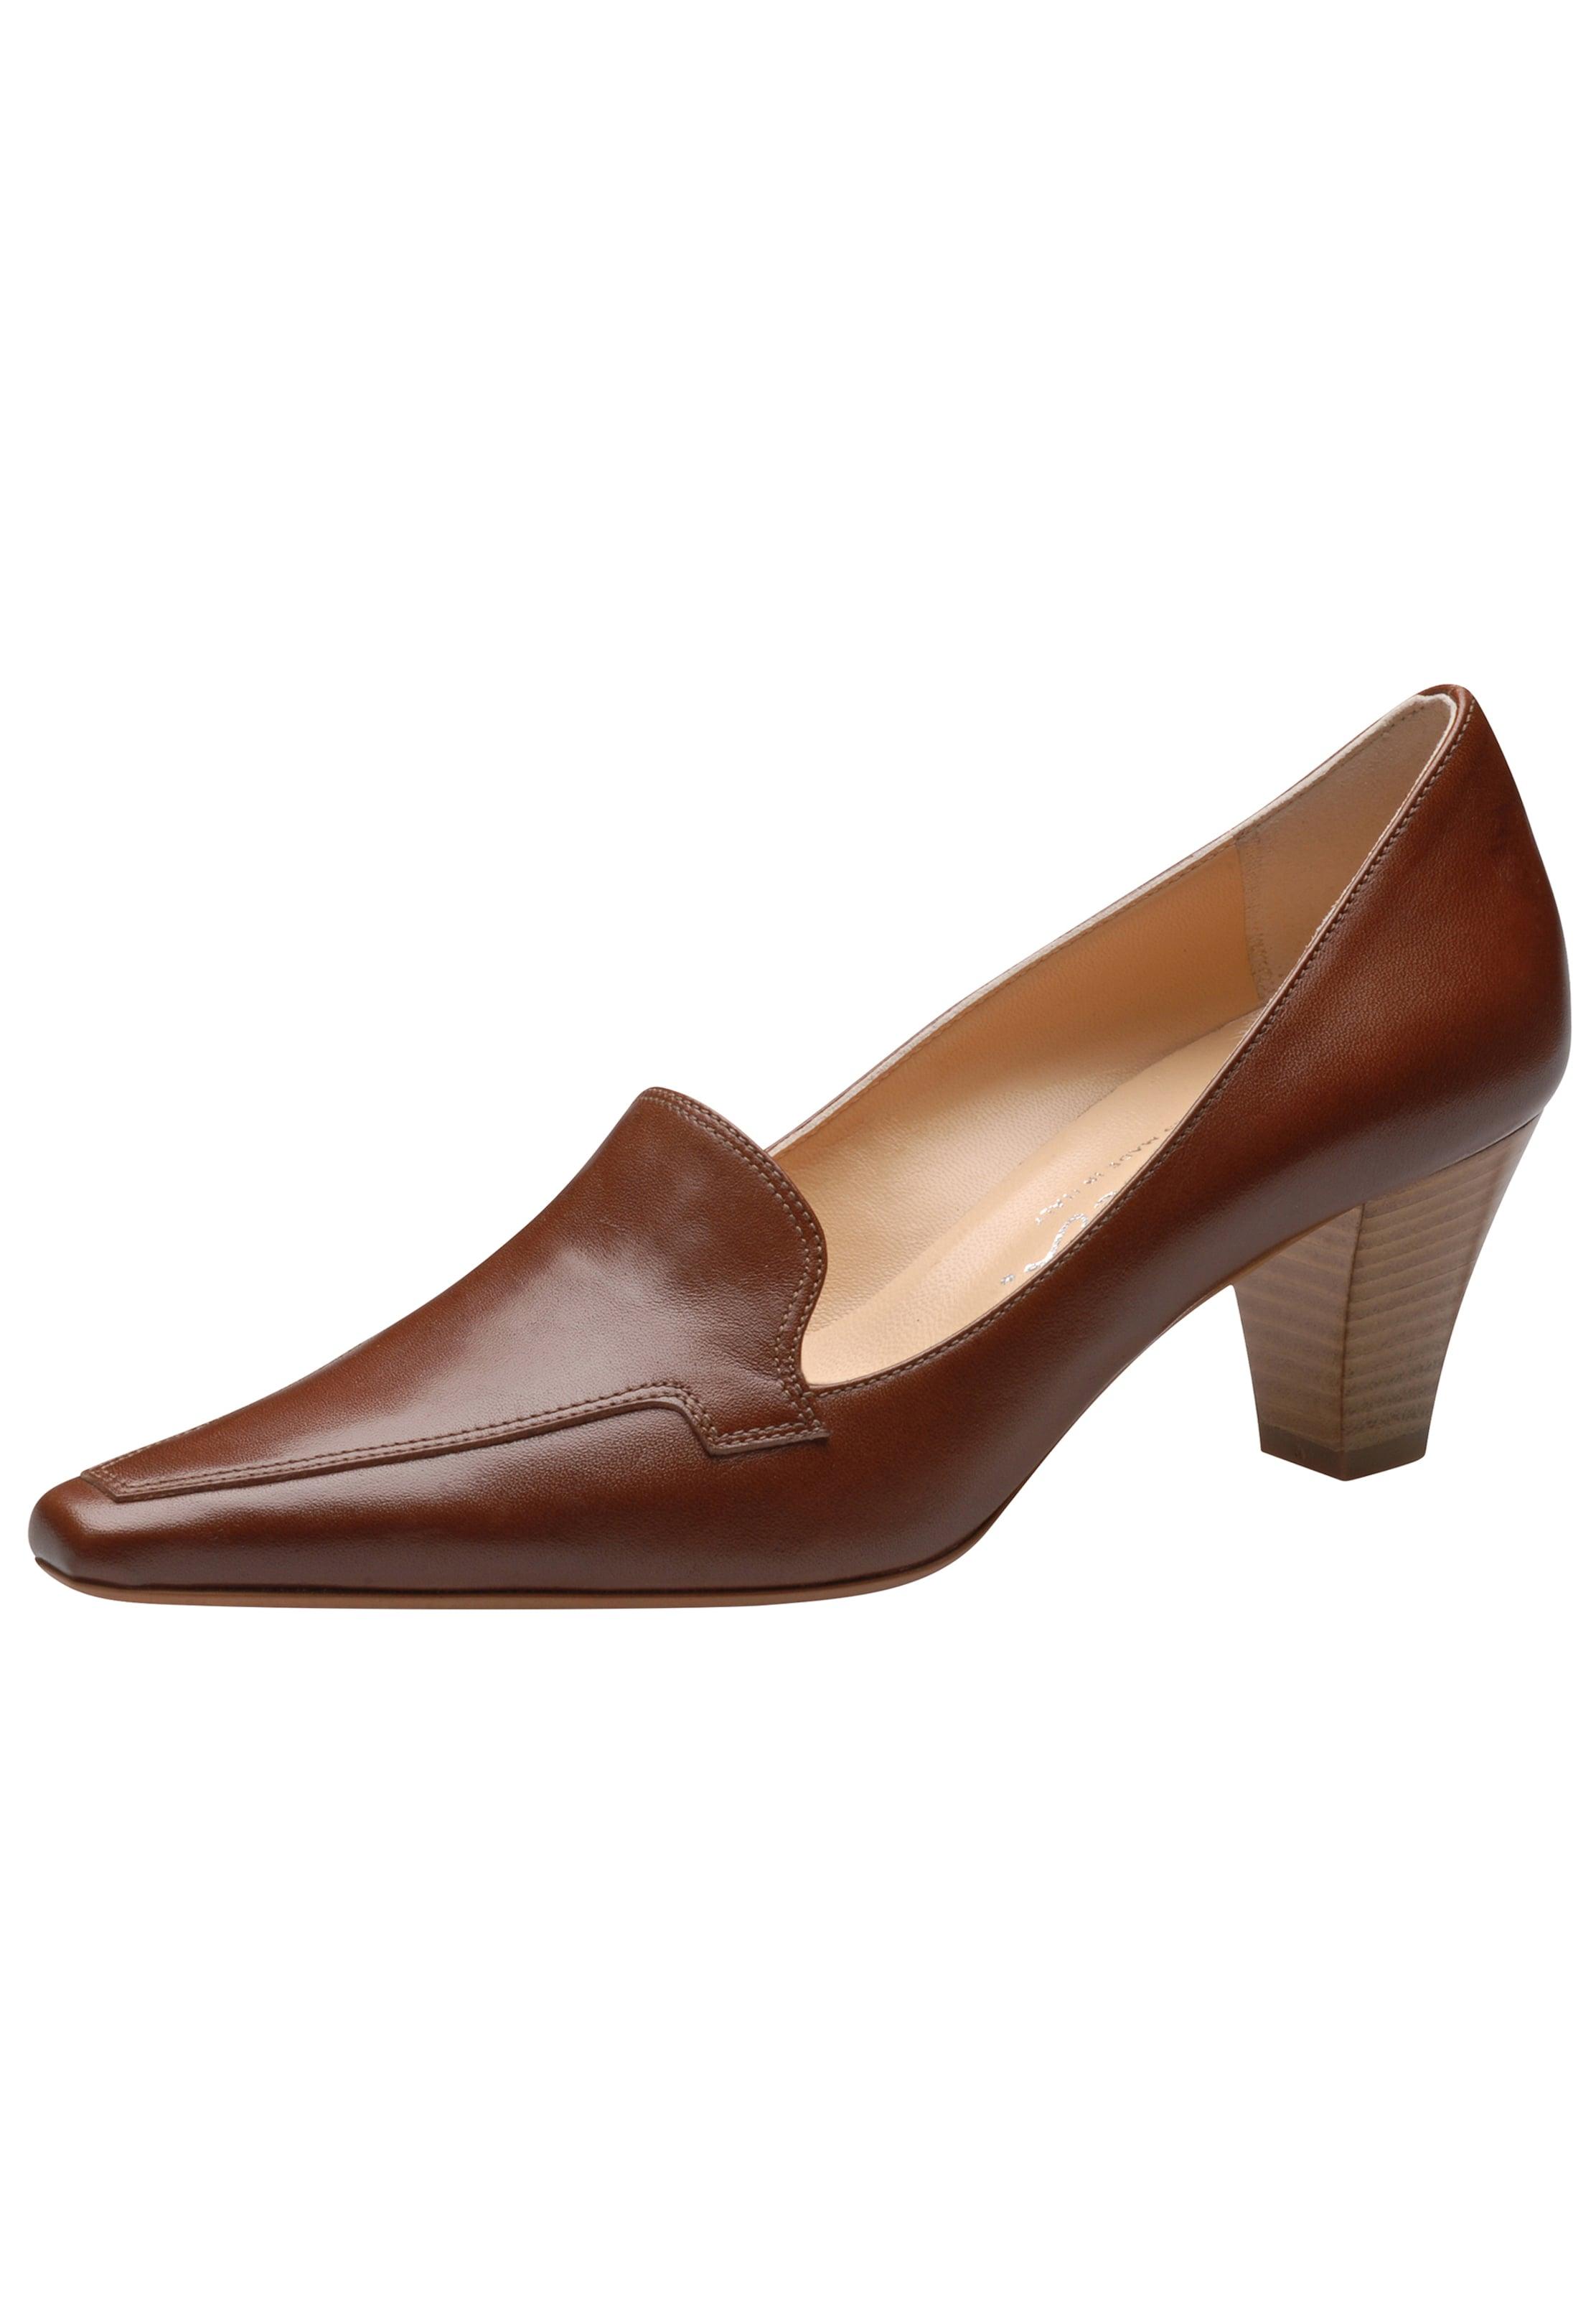 1d5651d3e0cd38 Haltbare billige Mode billige Haltbare Schuhe EVITA